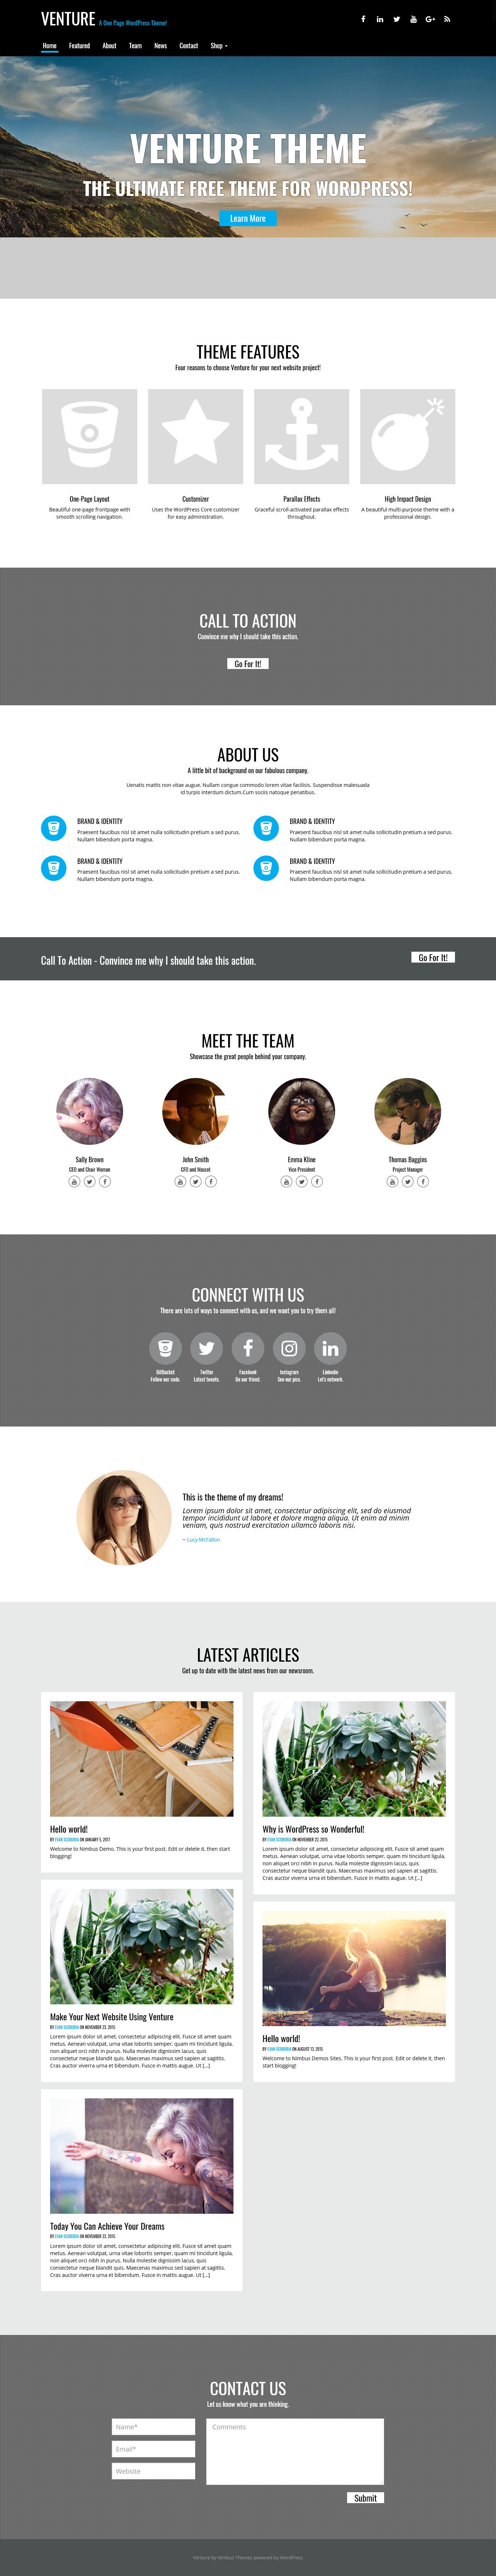 Venture - Best Premium Parallax WordPress Theme